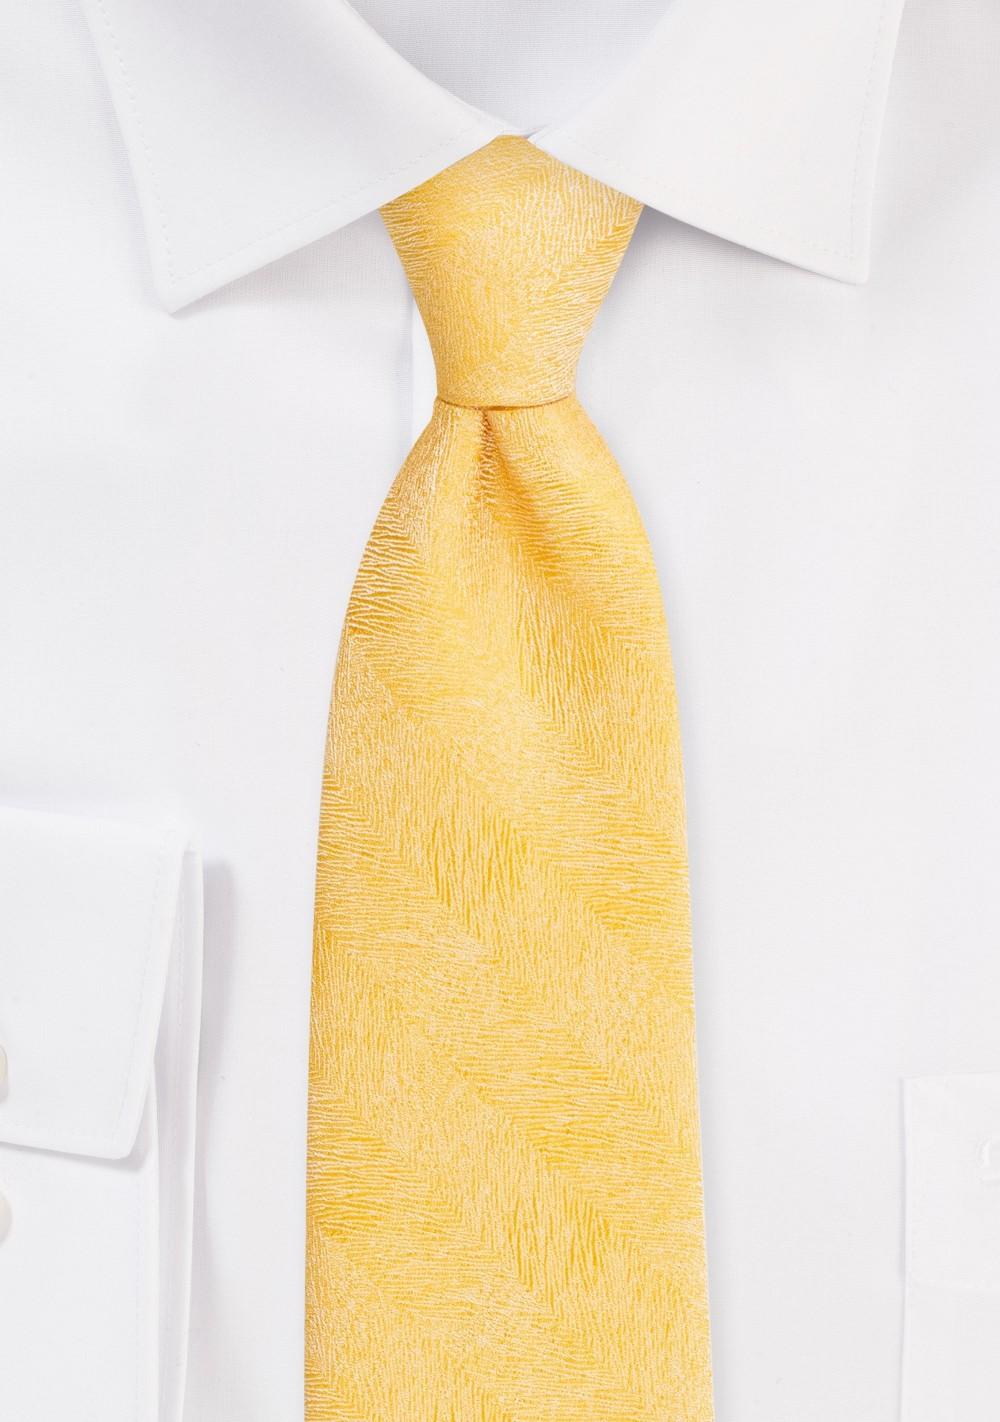 Wood Grain Weave Tie in Sunflower Yellow